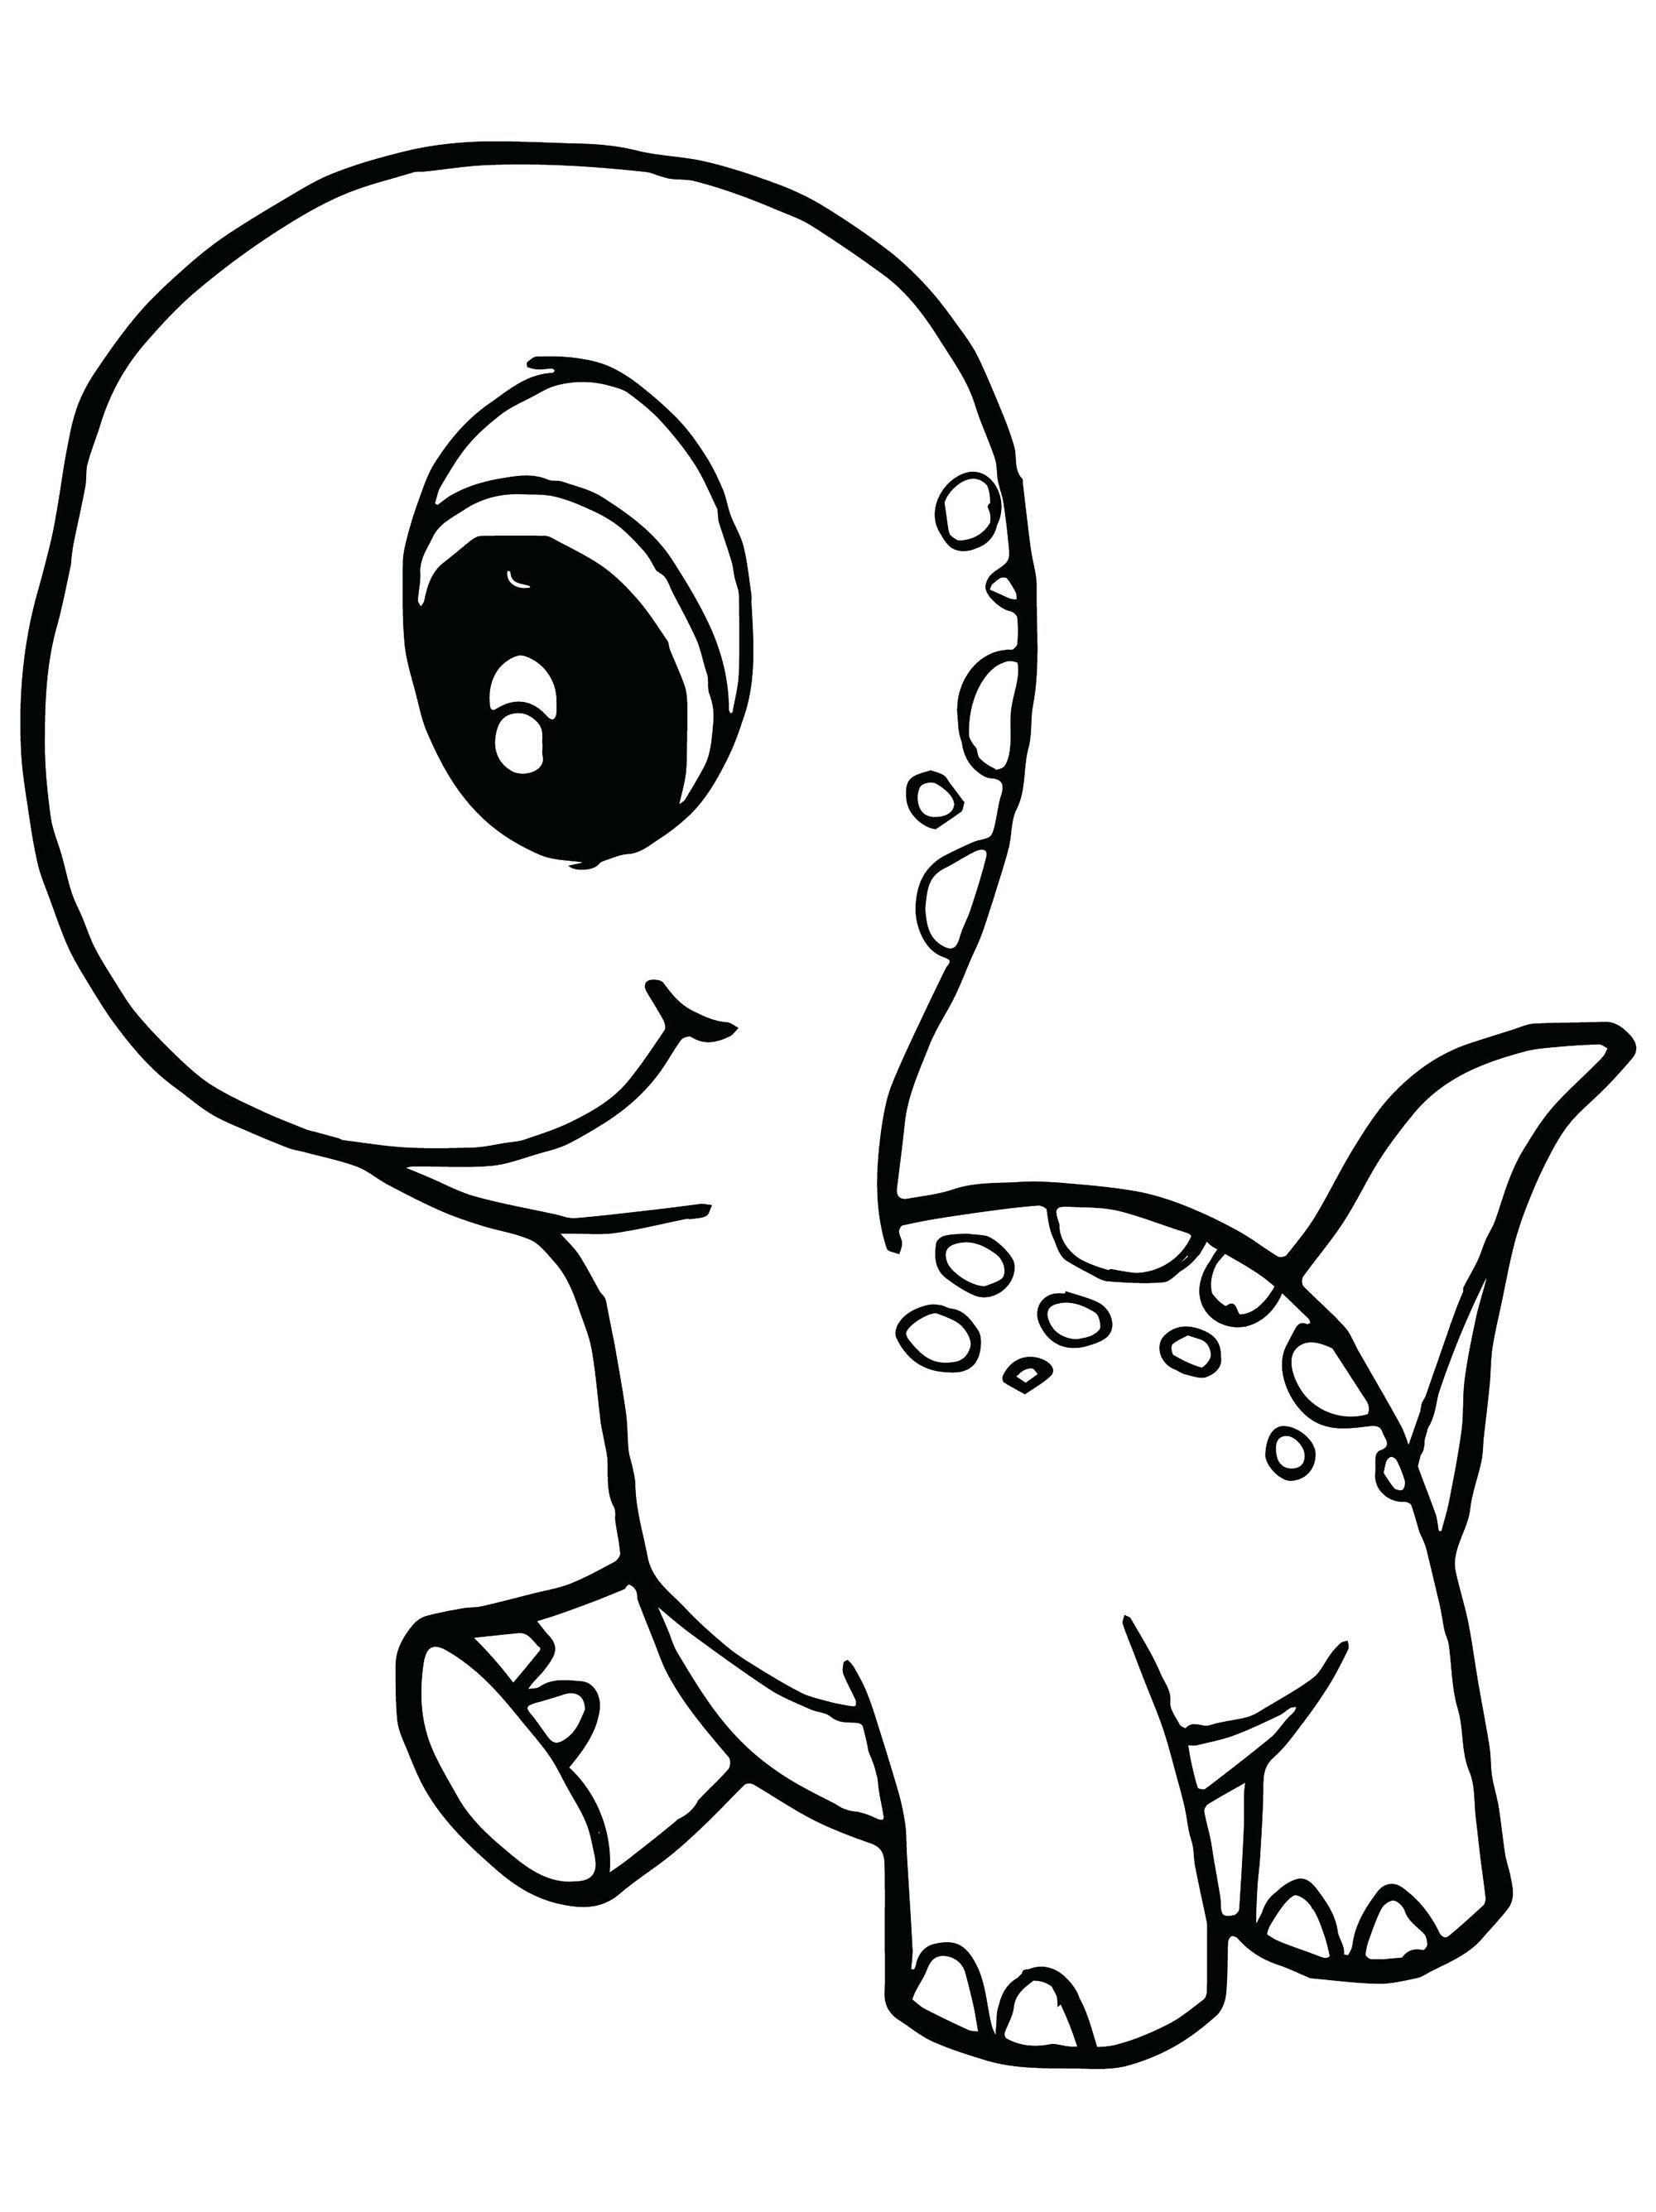 51 Coloring Page Dinosaurs Dinosaur Coloring Pages Disney Coloring Pages Dragon Coloring Page [ 2672 x 2000 Pixel ]